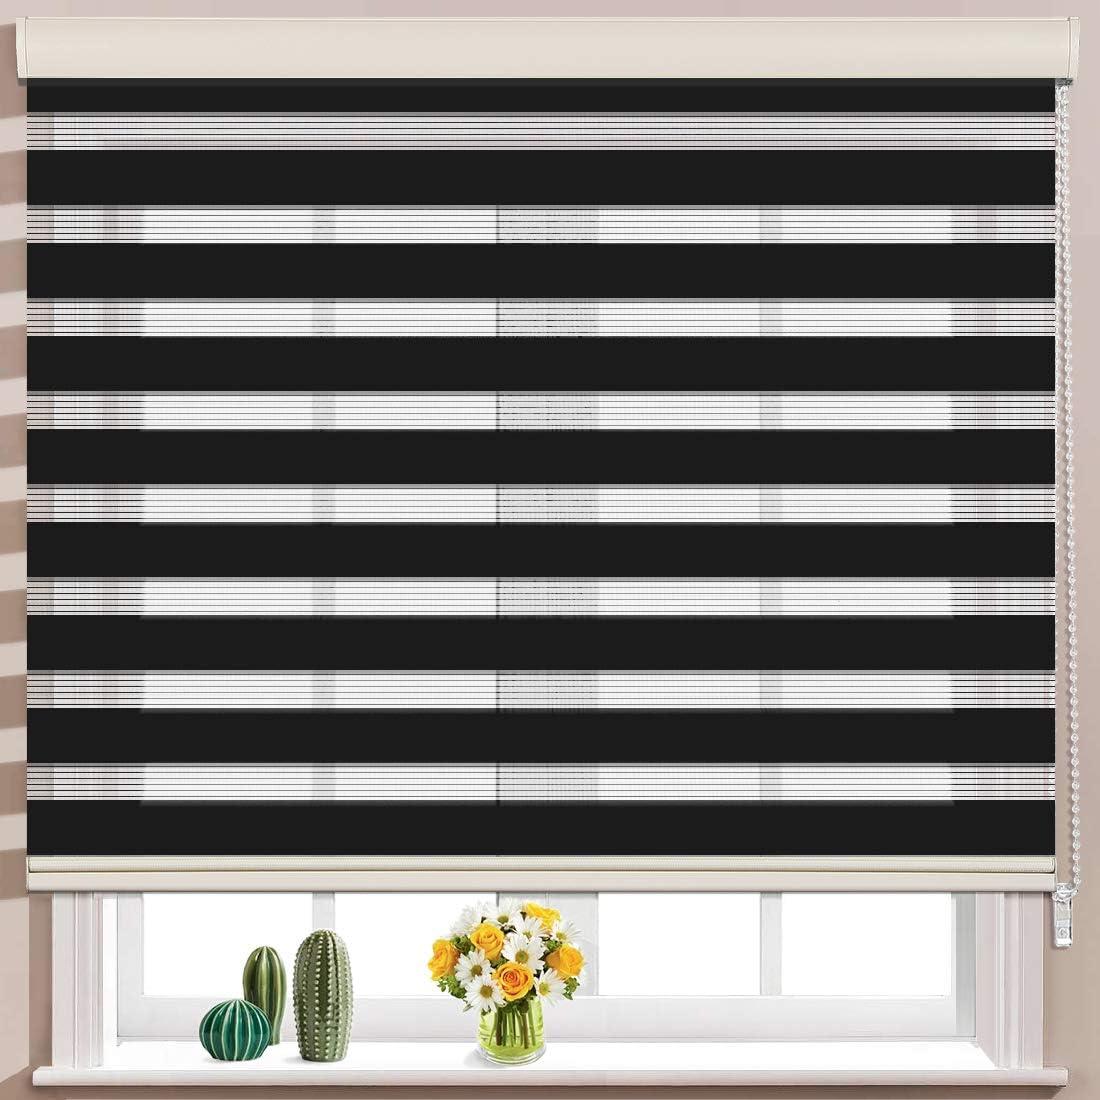 Keego Window Blinds Custom Cut to Size